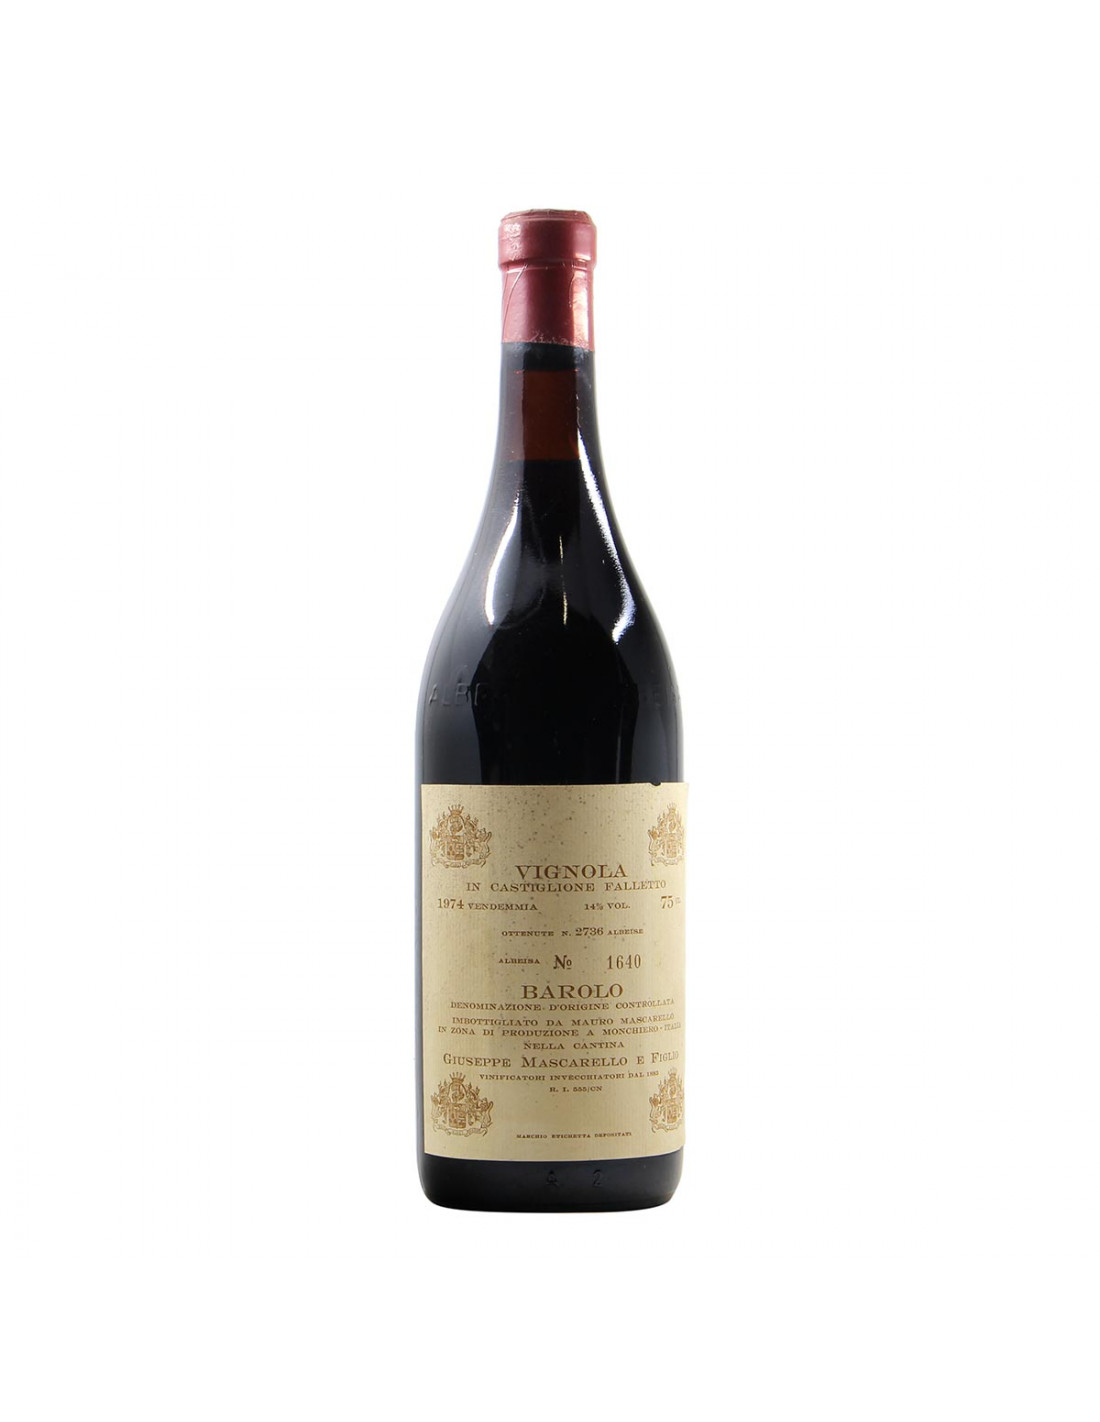 Giuseppe Mascarello Barolo Vignola 1974 Grandi Bottiglie